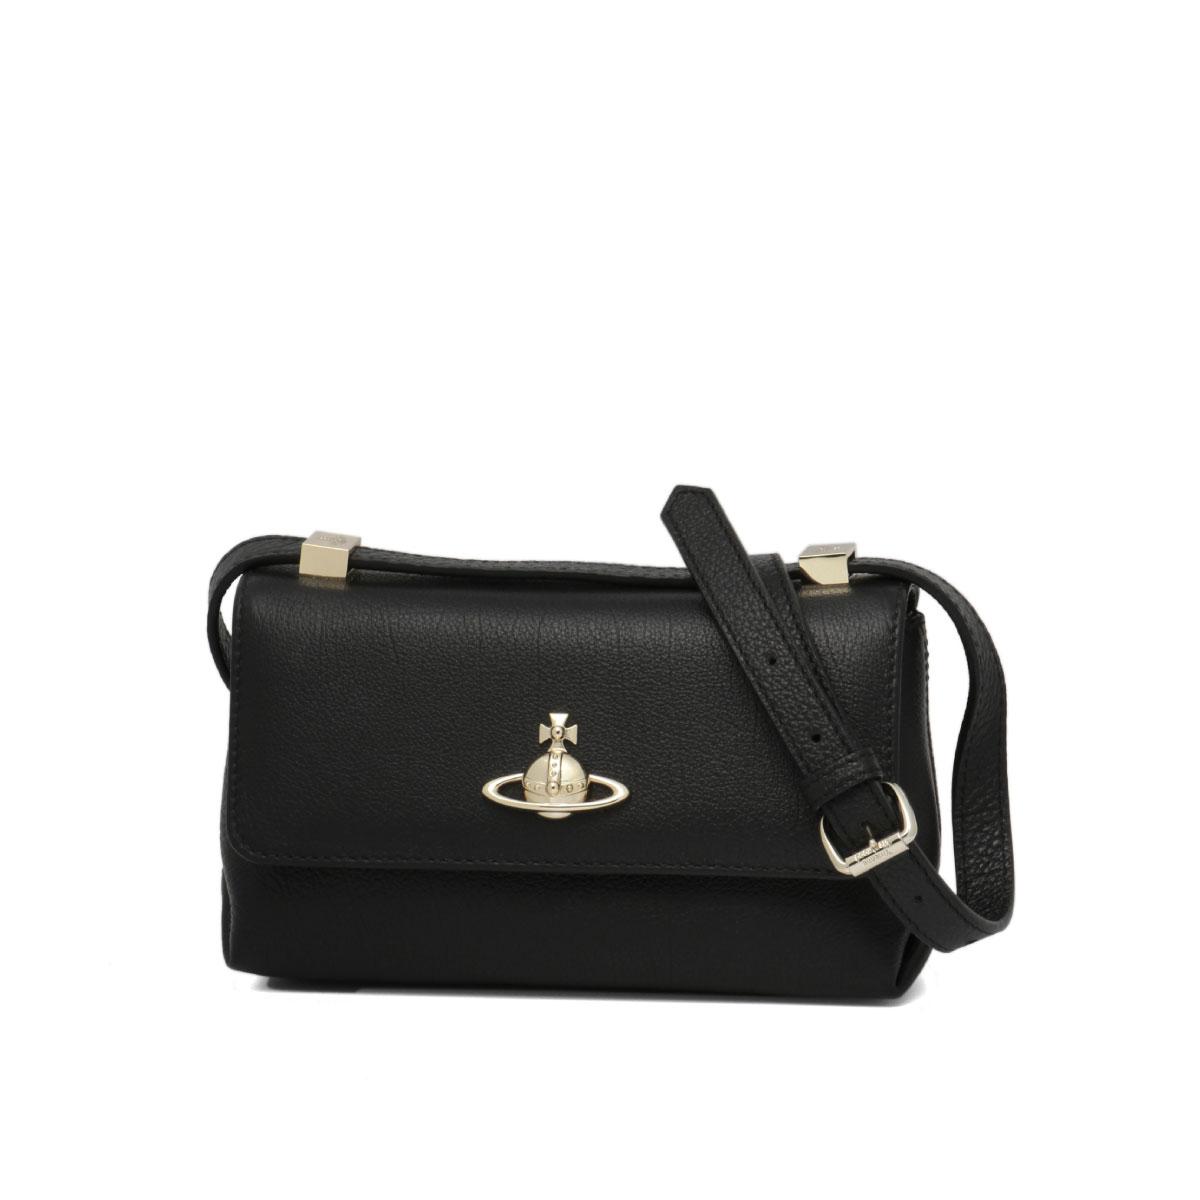 43030038 Vivien Waist Wood Vivienne Westwood Bag Lady 40212 N402 Shoulder Small Balm Black